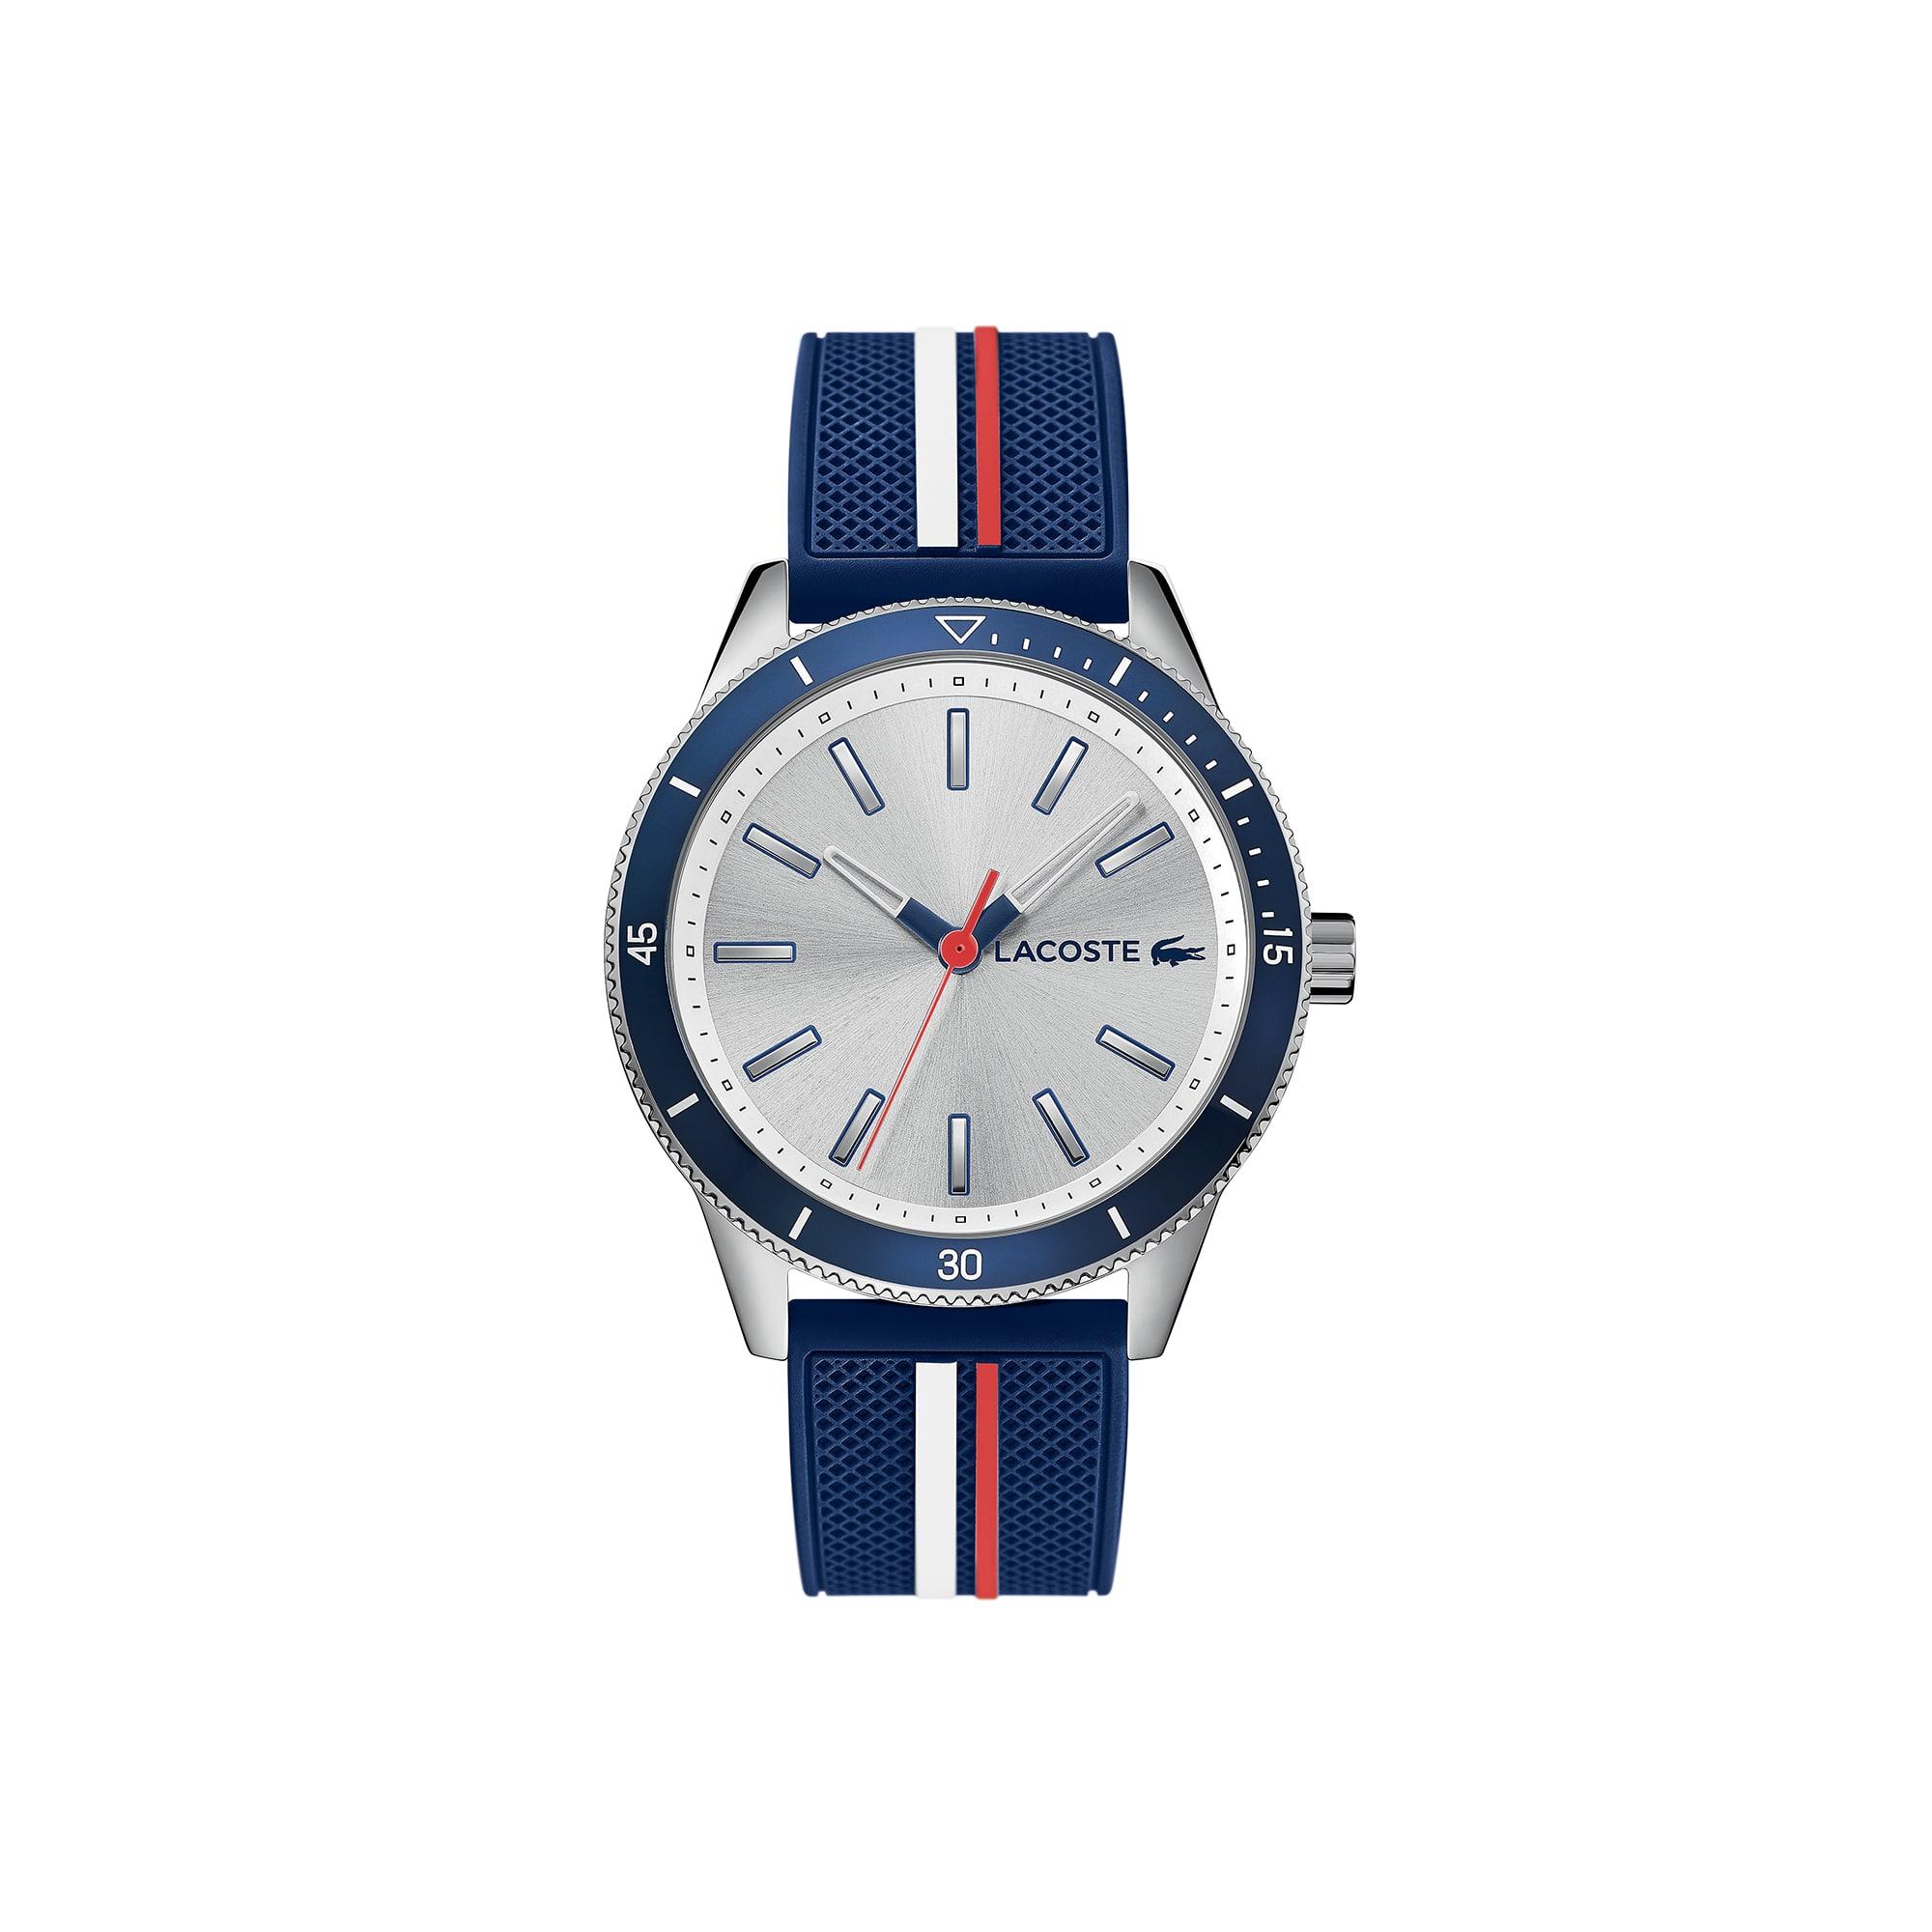 86e22f648 Lacoste Watches